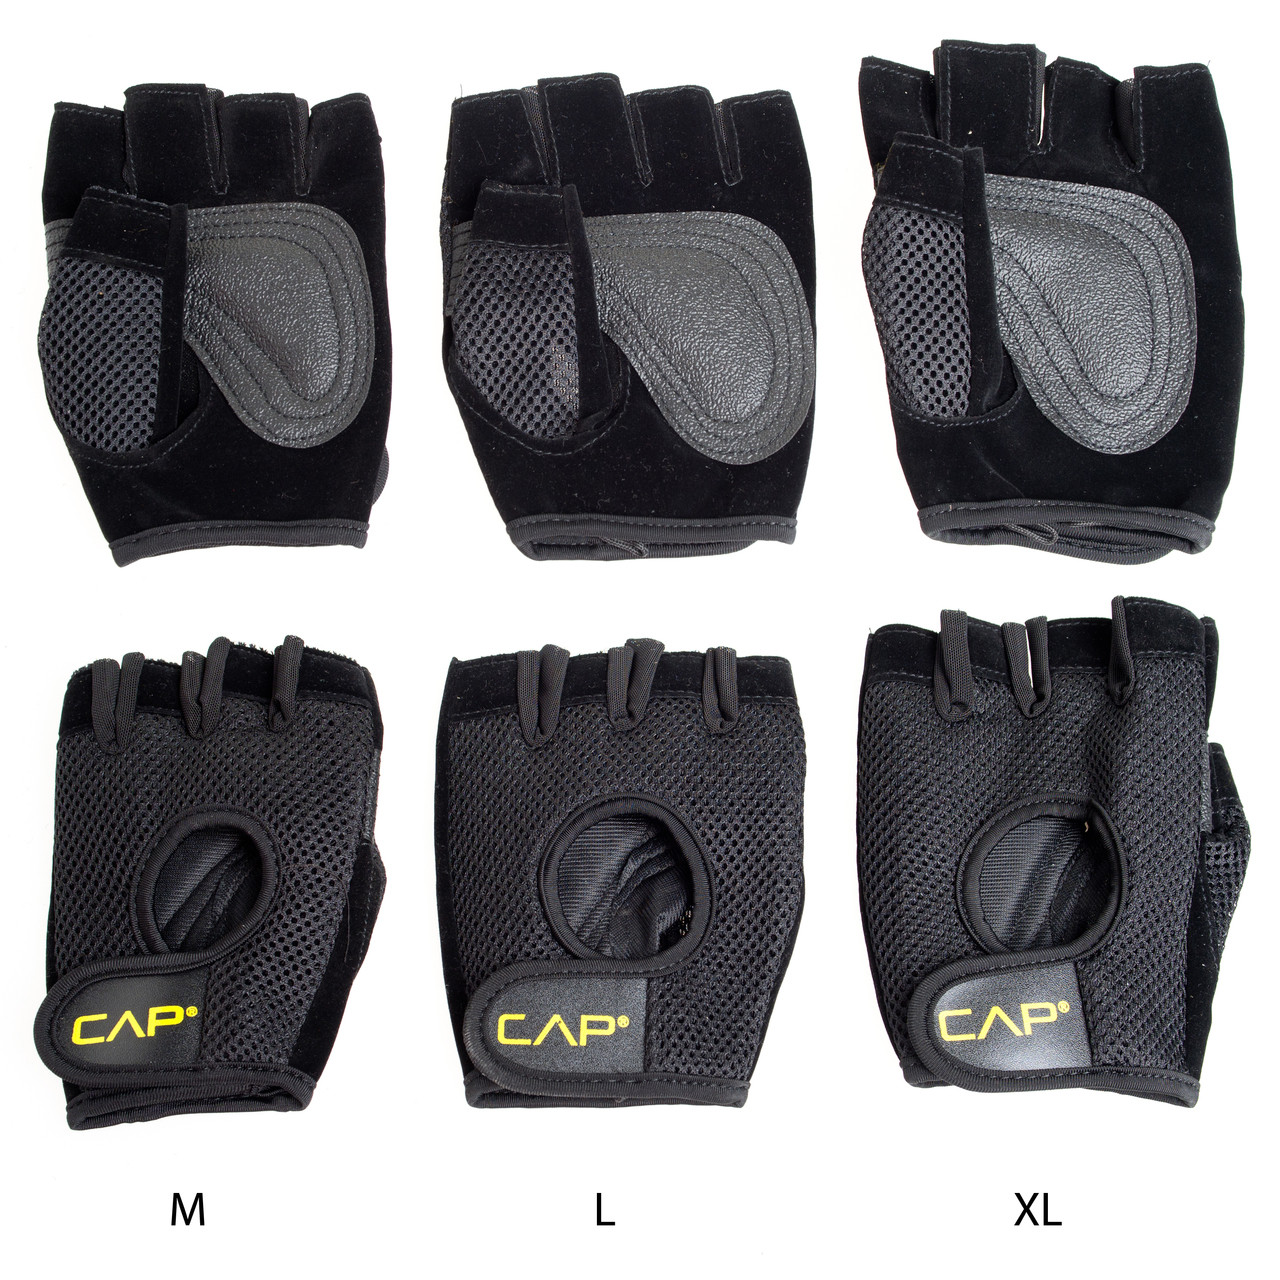 Mesh Weight Lifting Gloves: CAP Mesh Weightlifting Gloves (HHWG-CB001